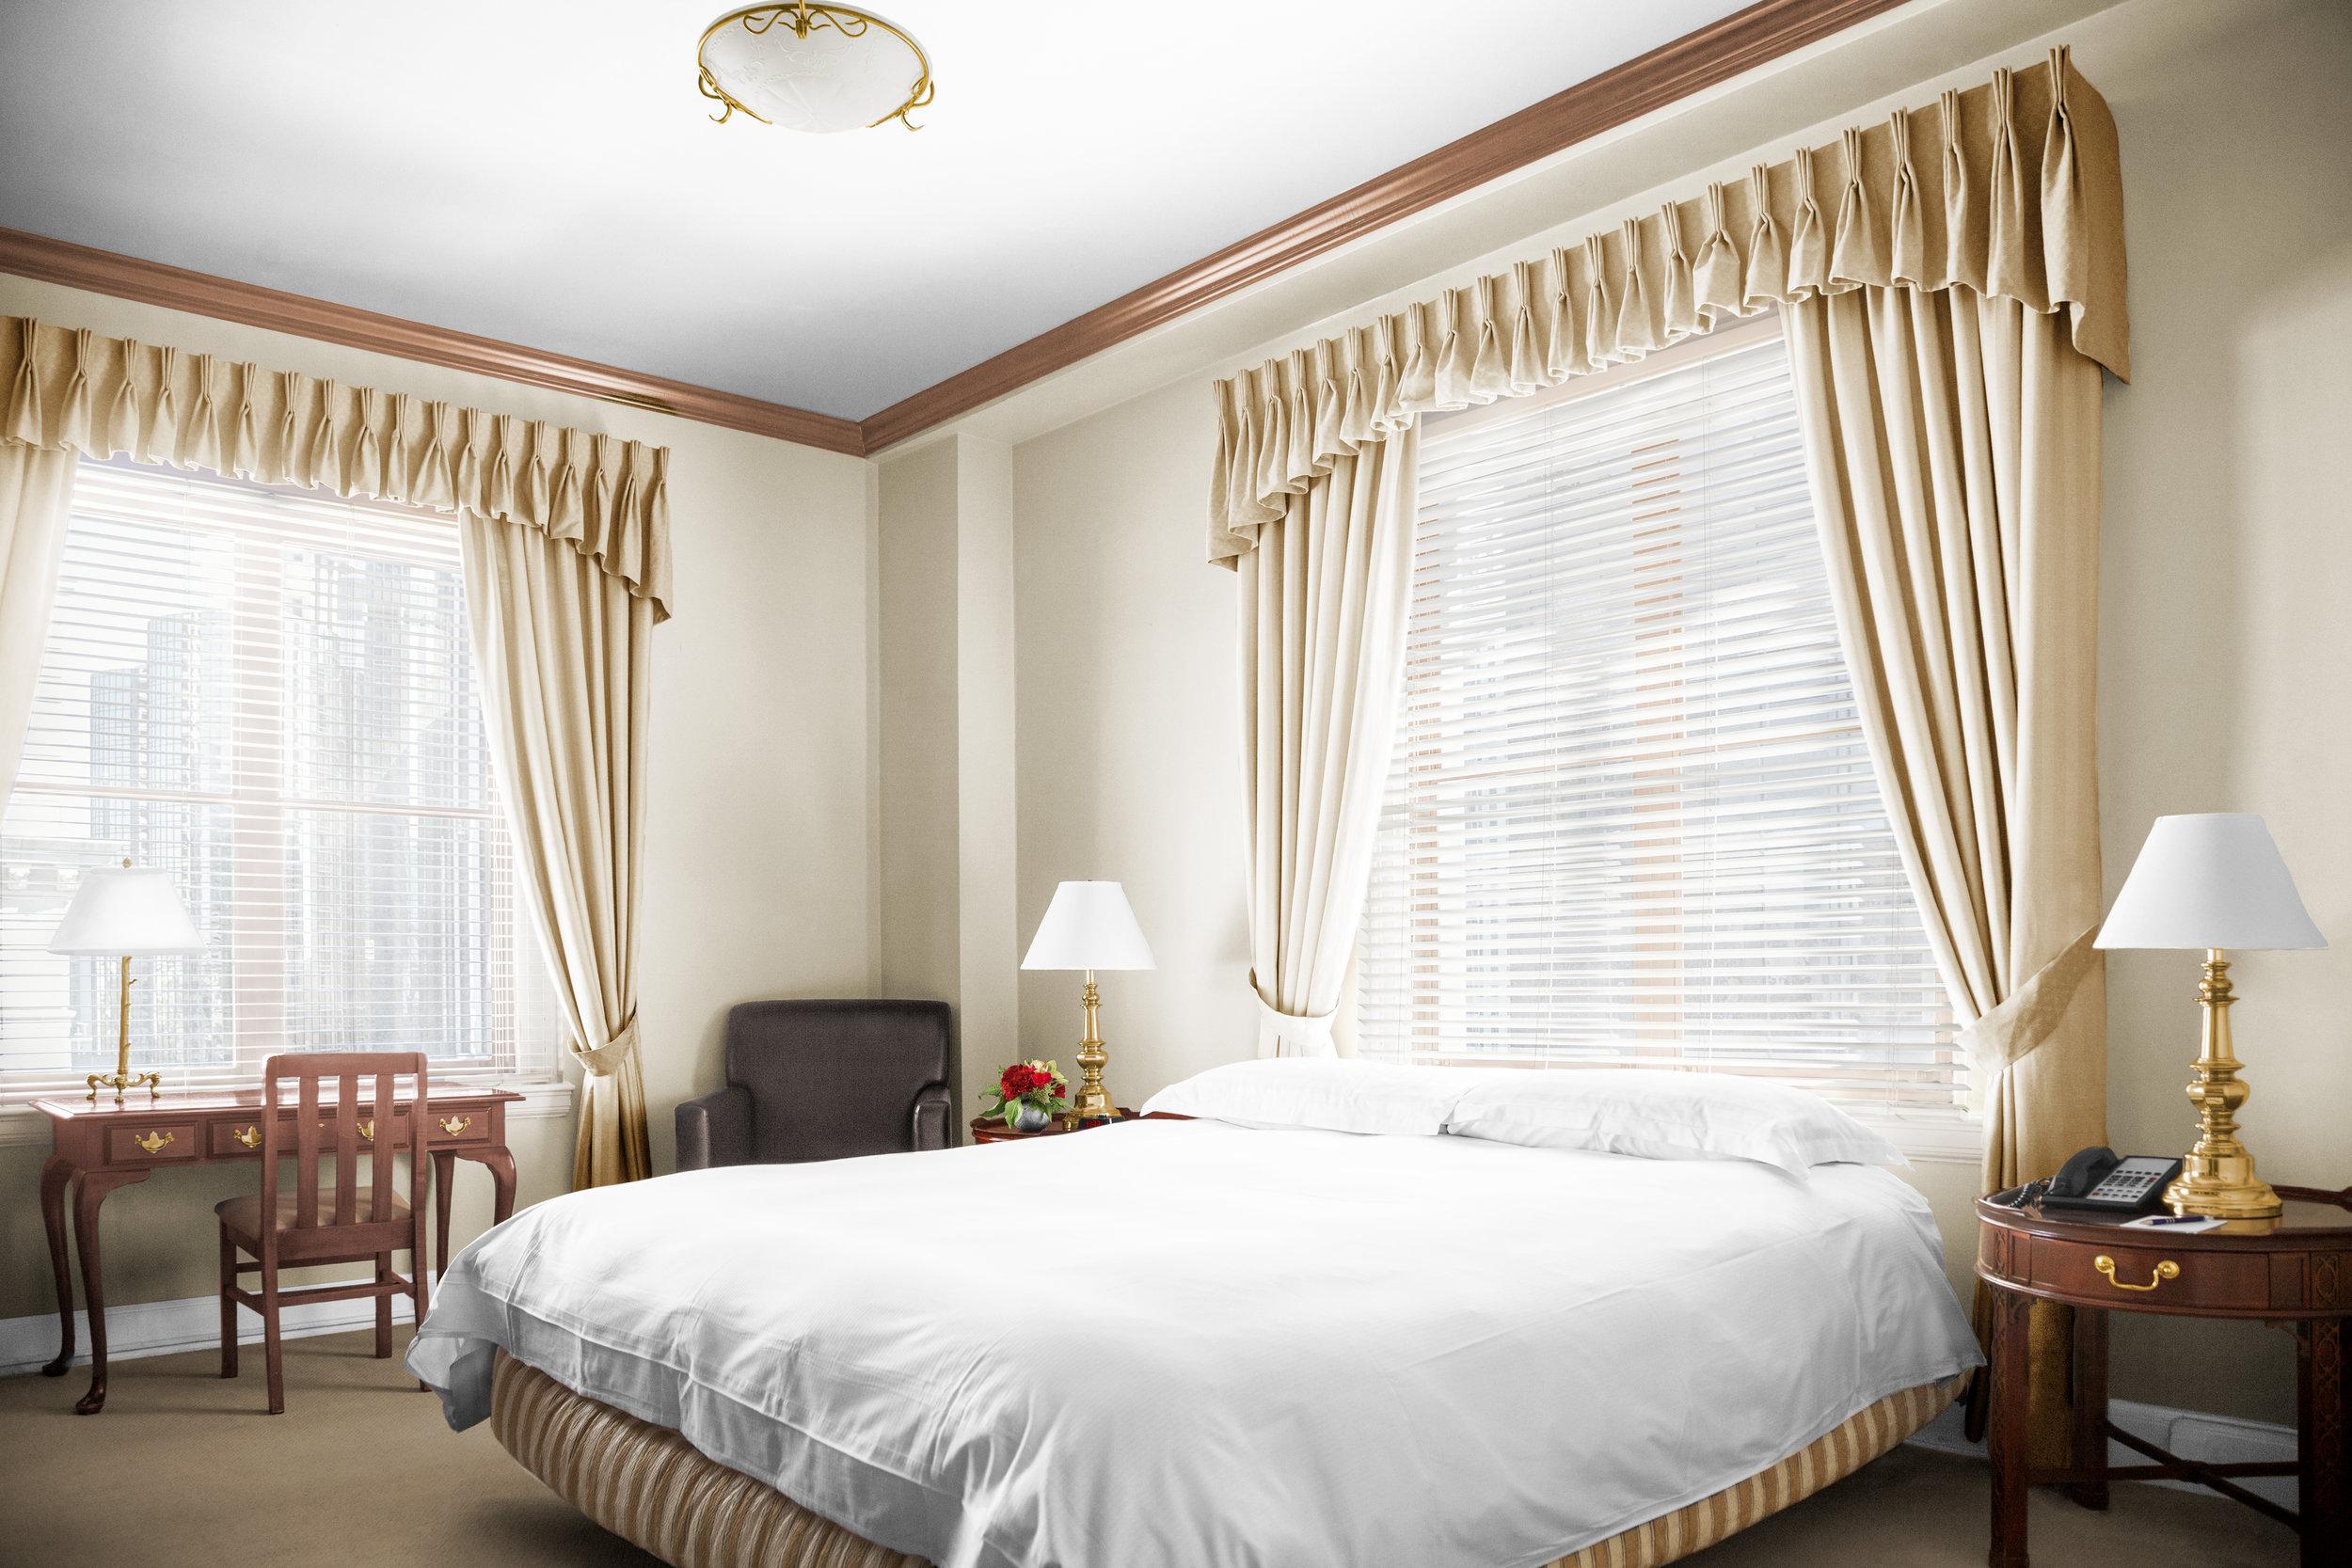 interior-photography-jonathan-club-los-angeles.jpg